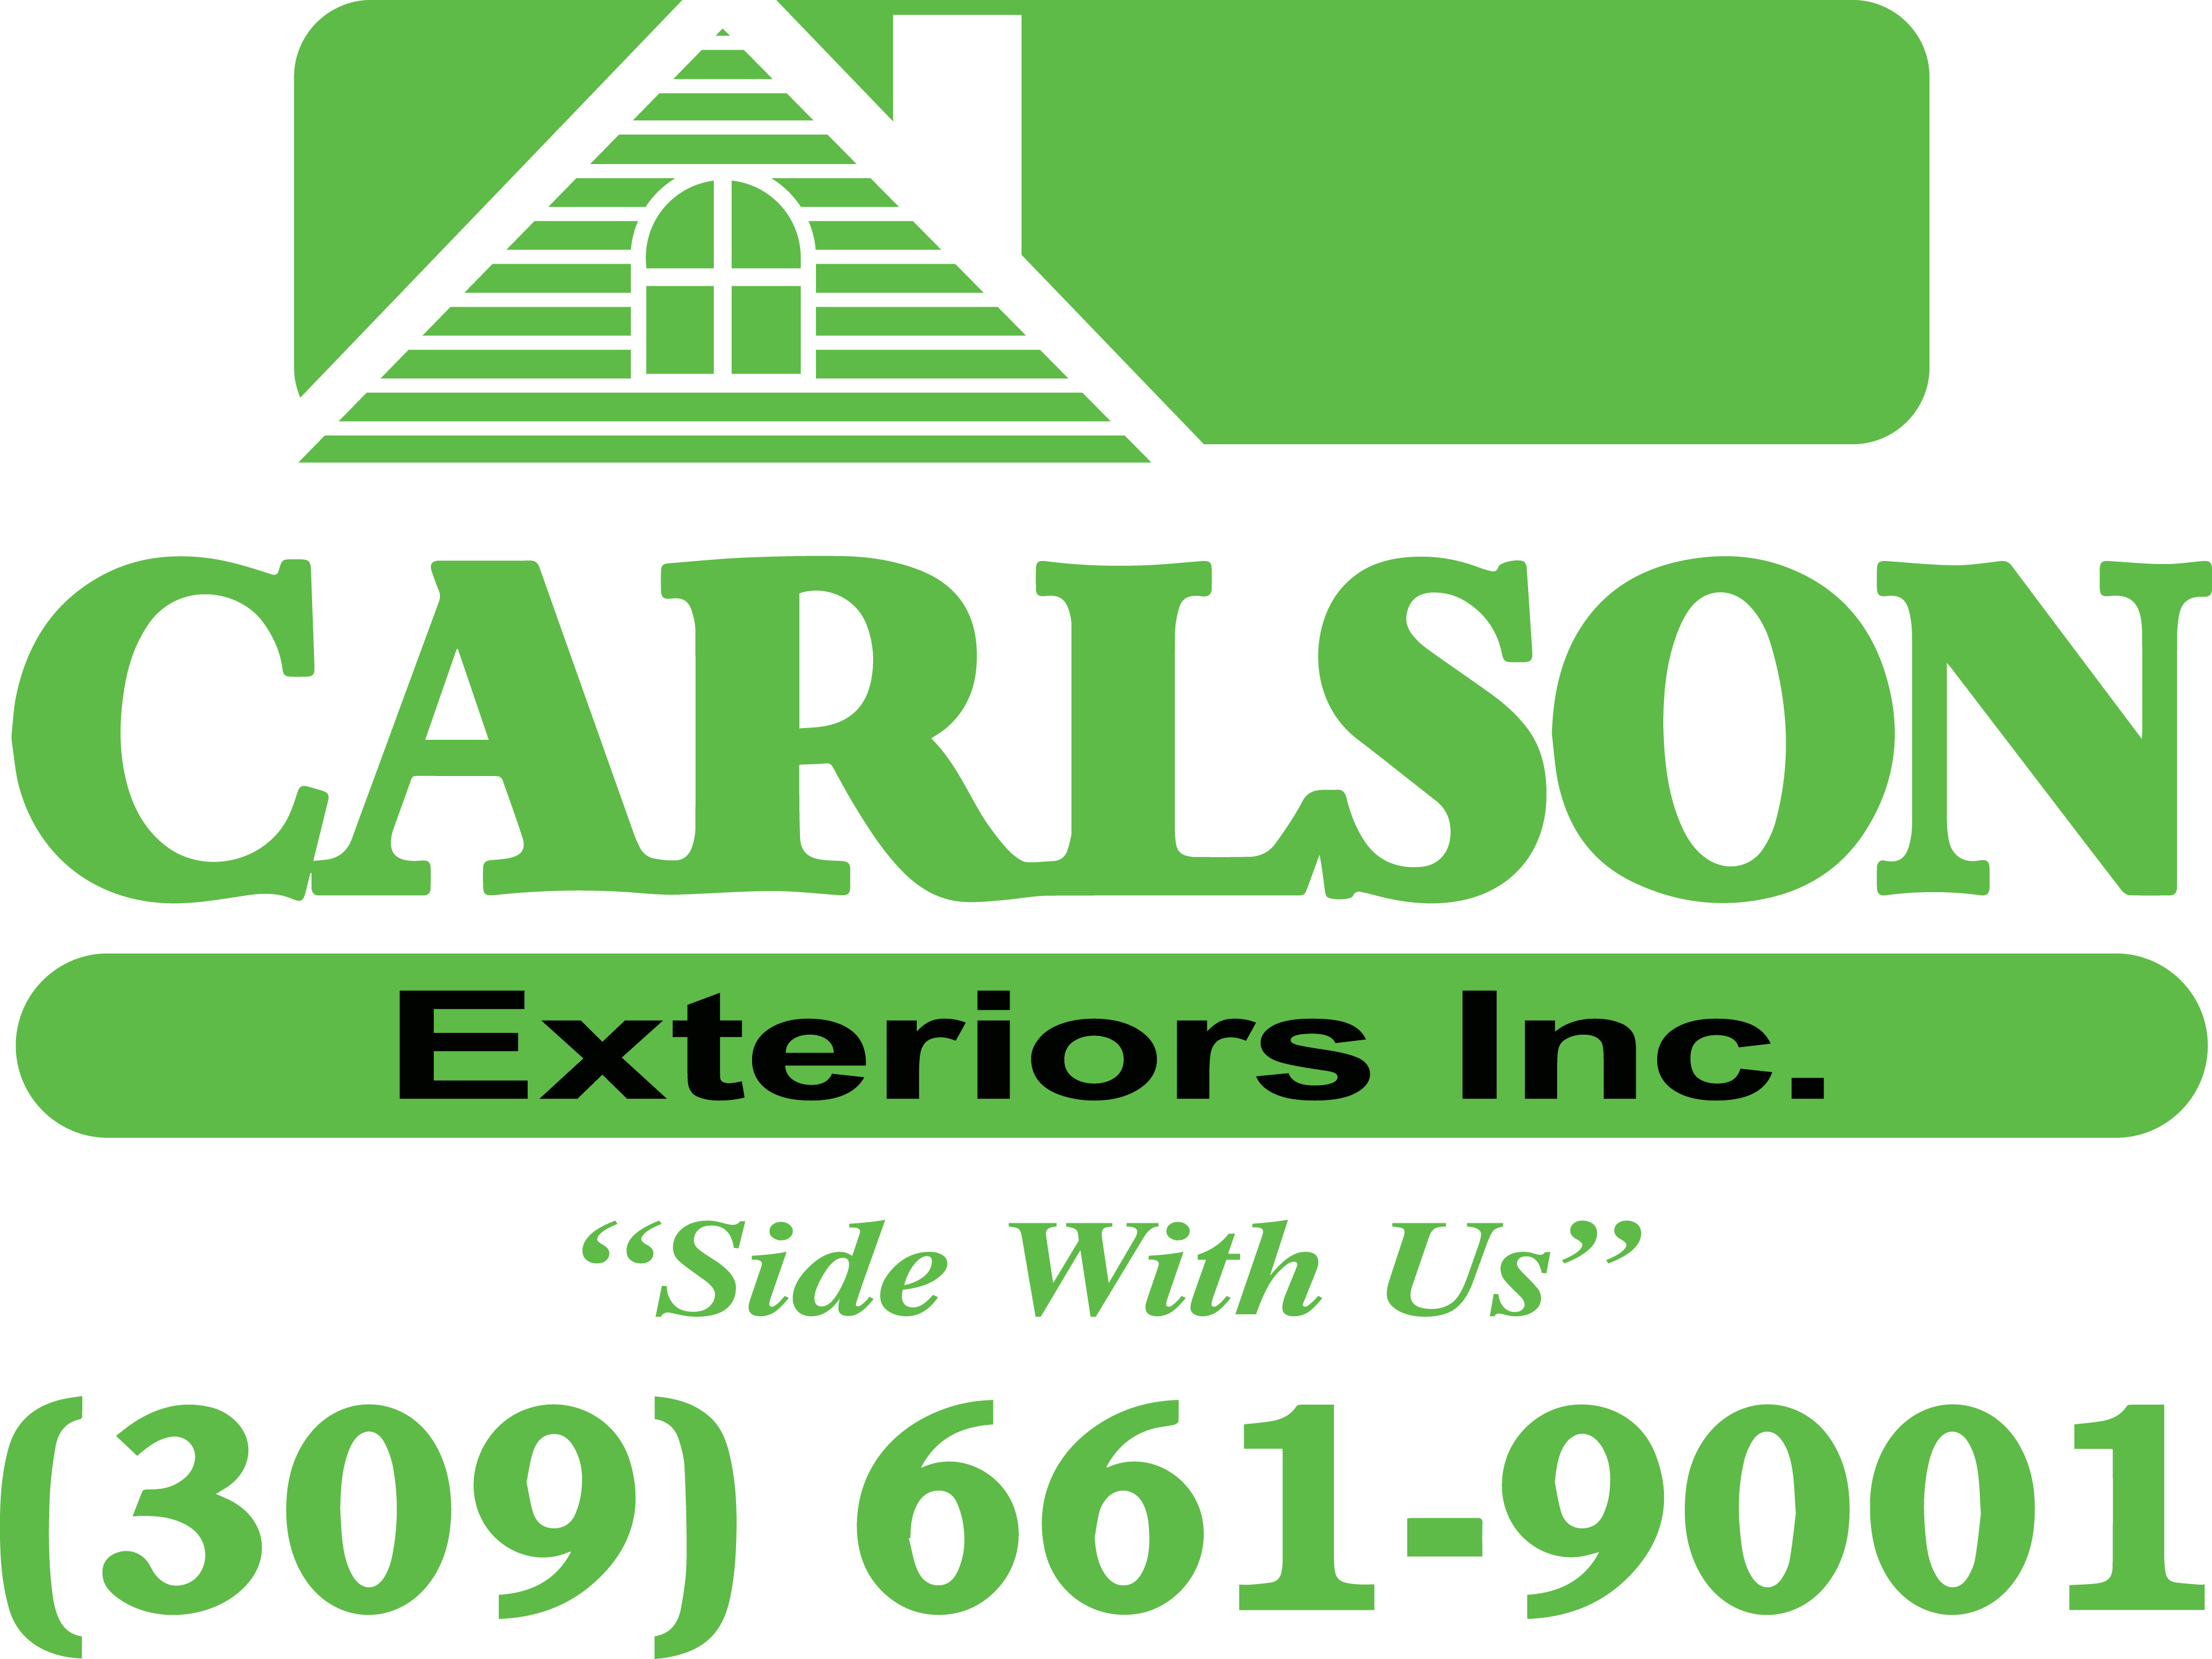 Carlson Exteriors Inc.